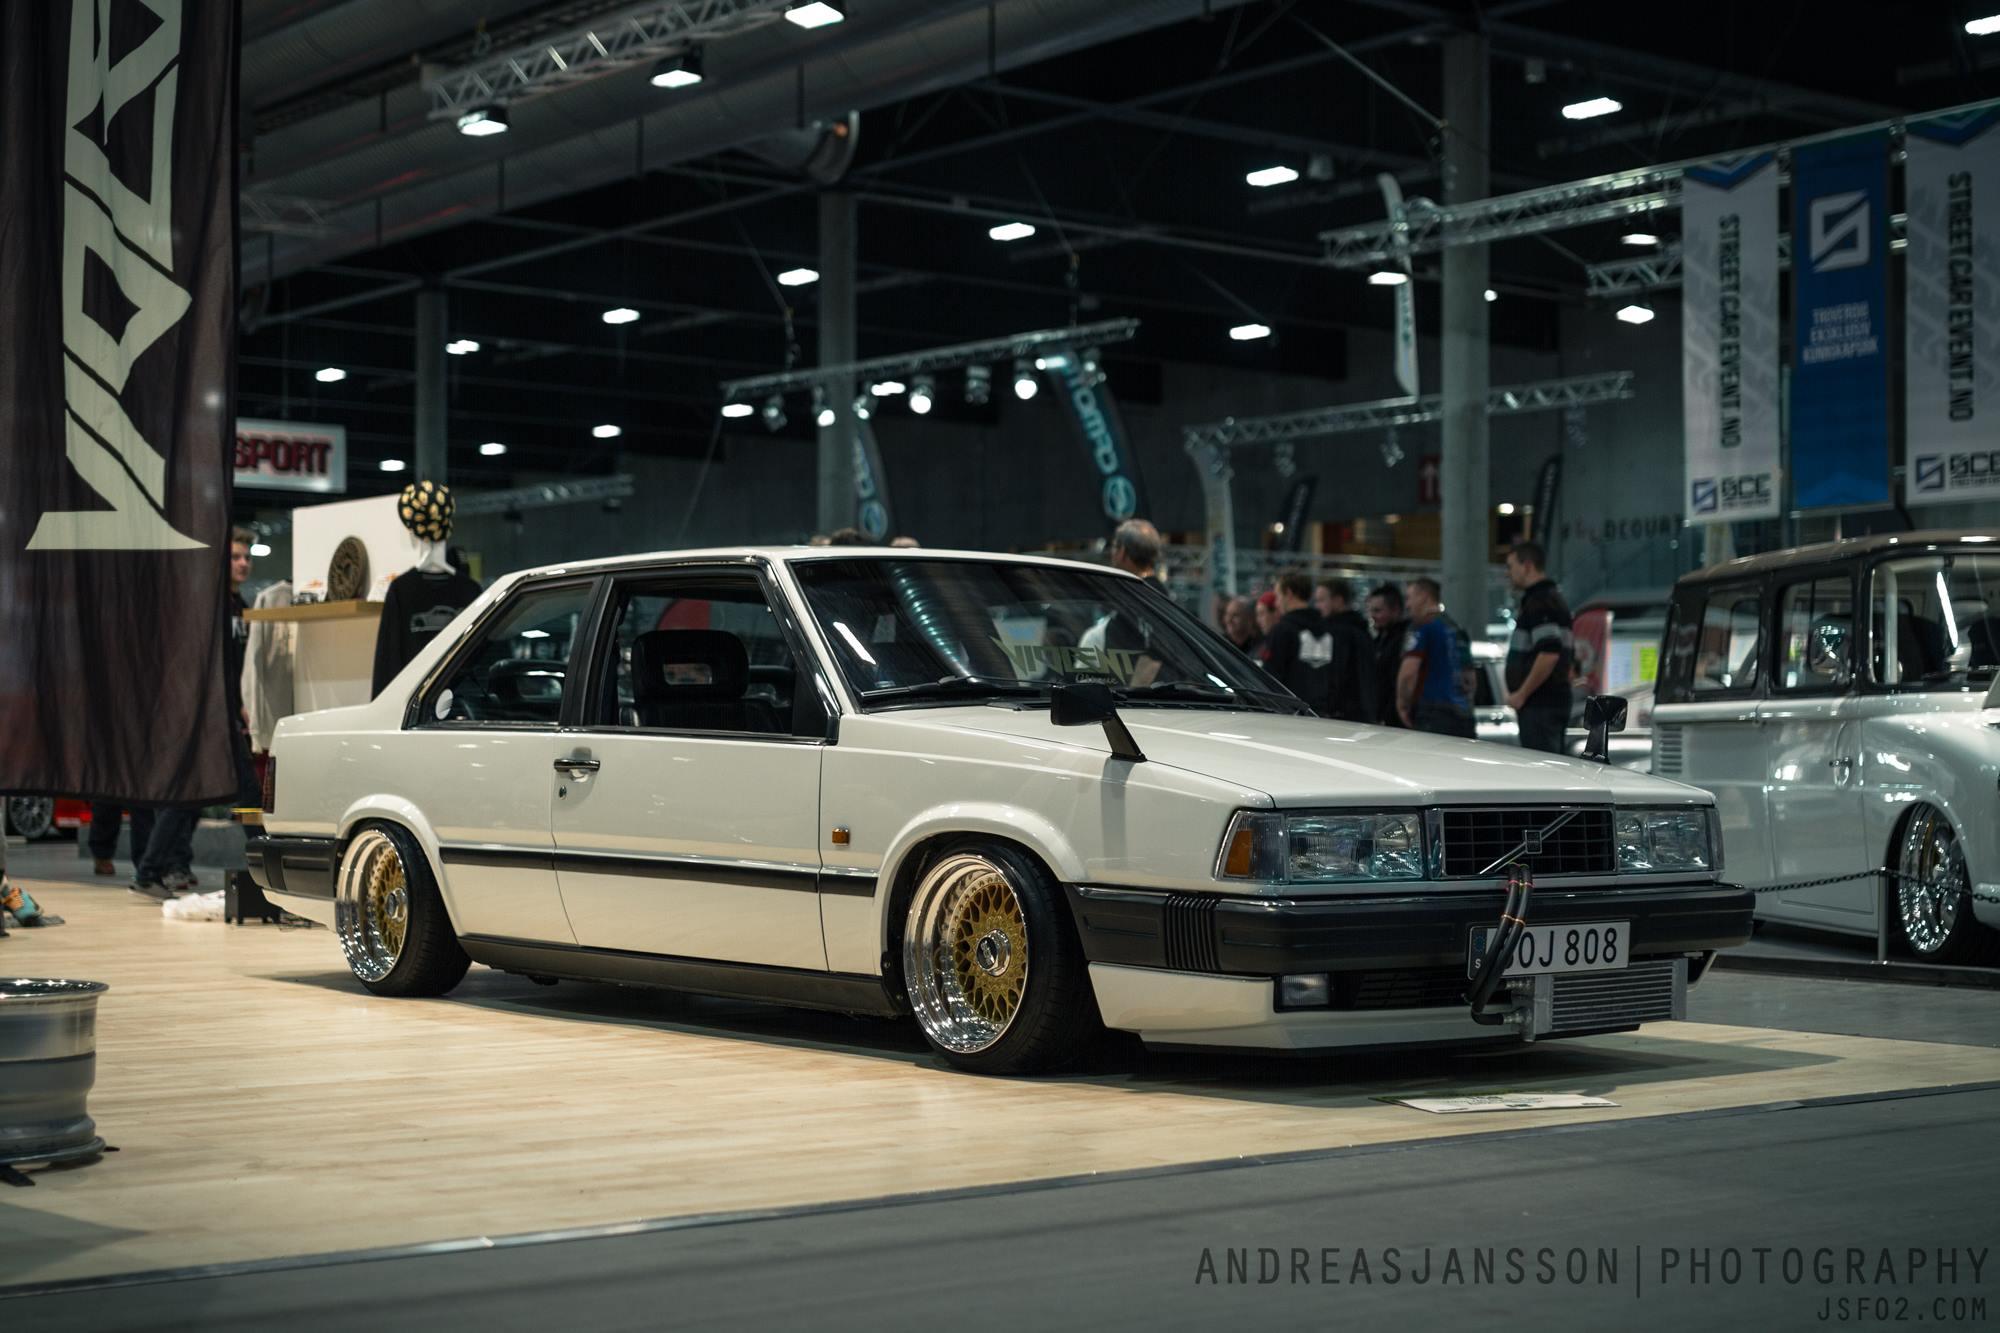 1987 Volvo 780 Bertone Turbo